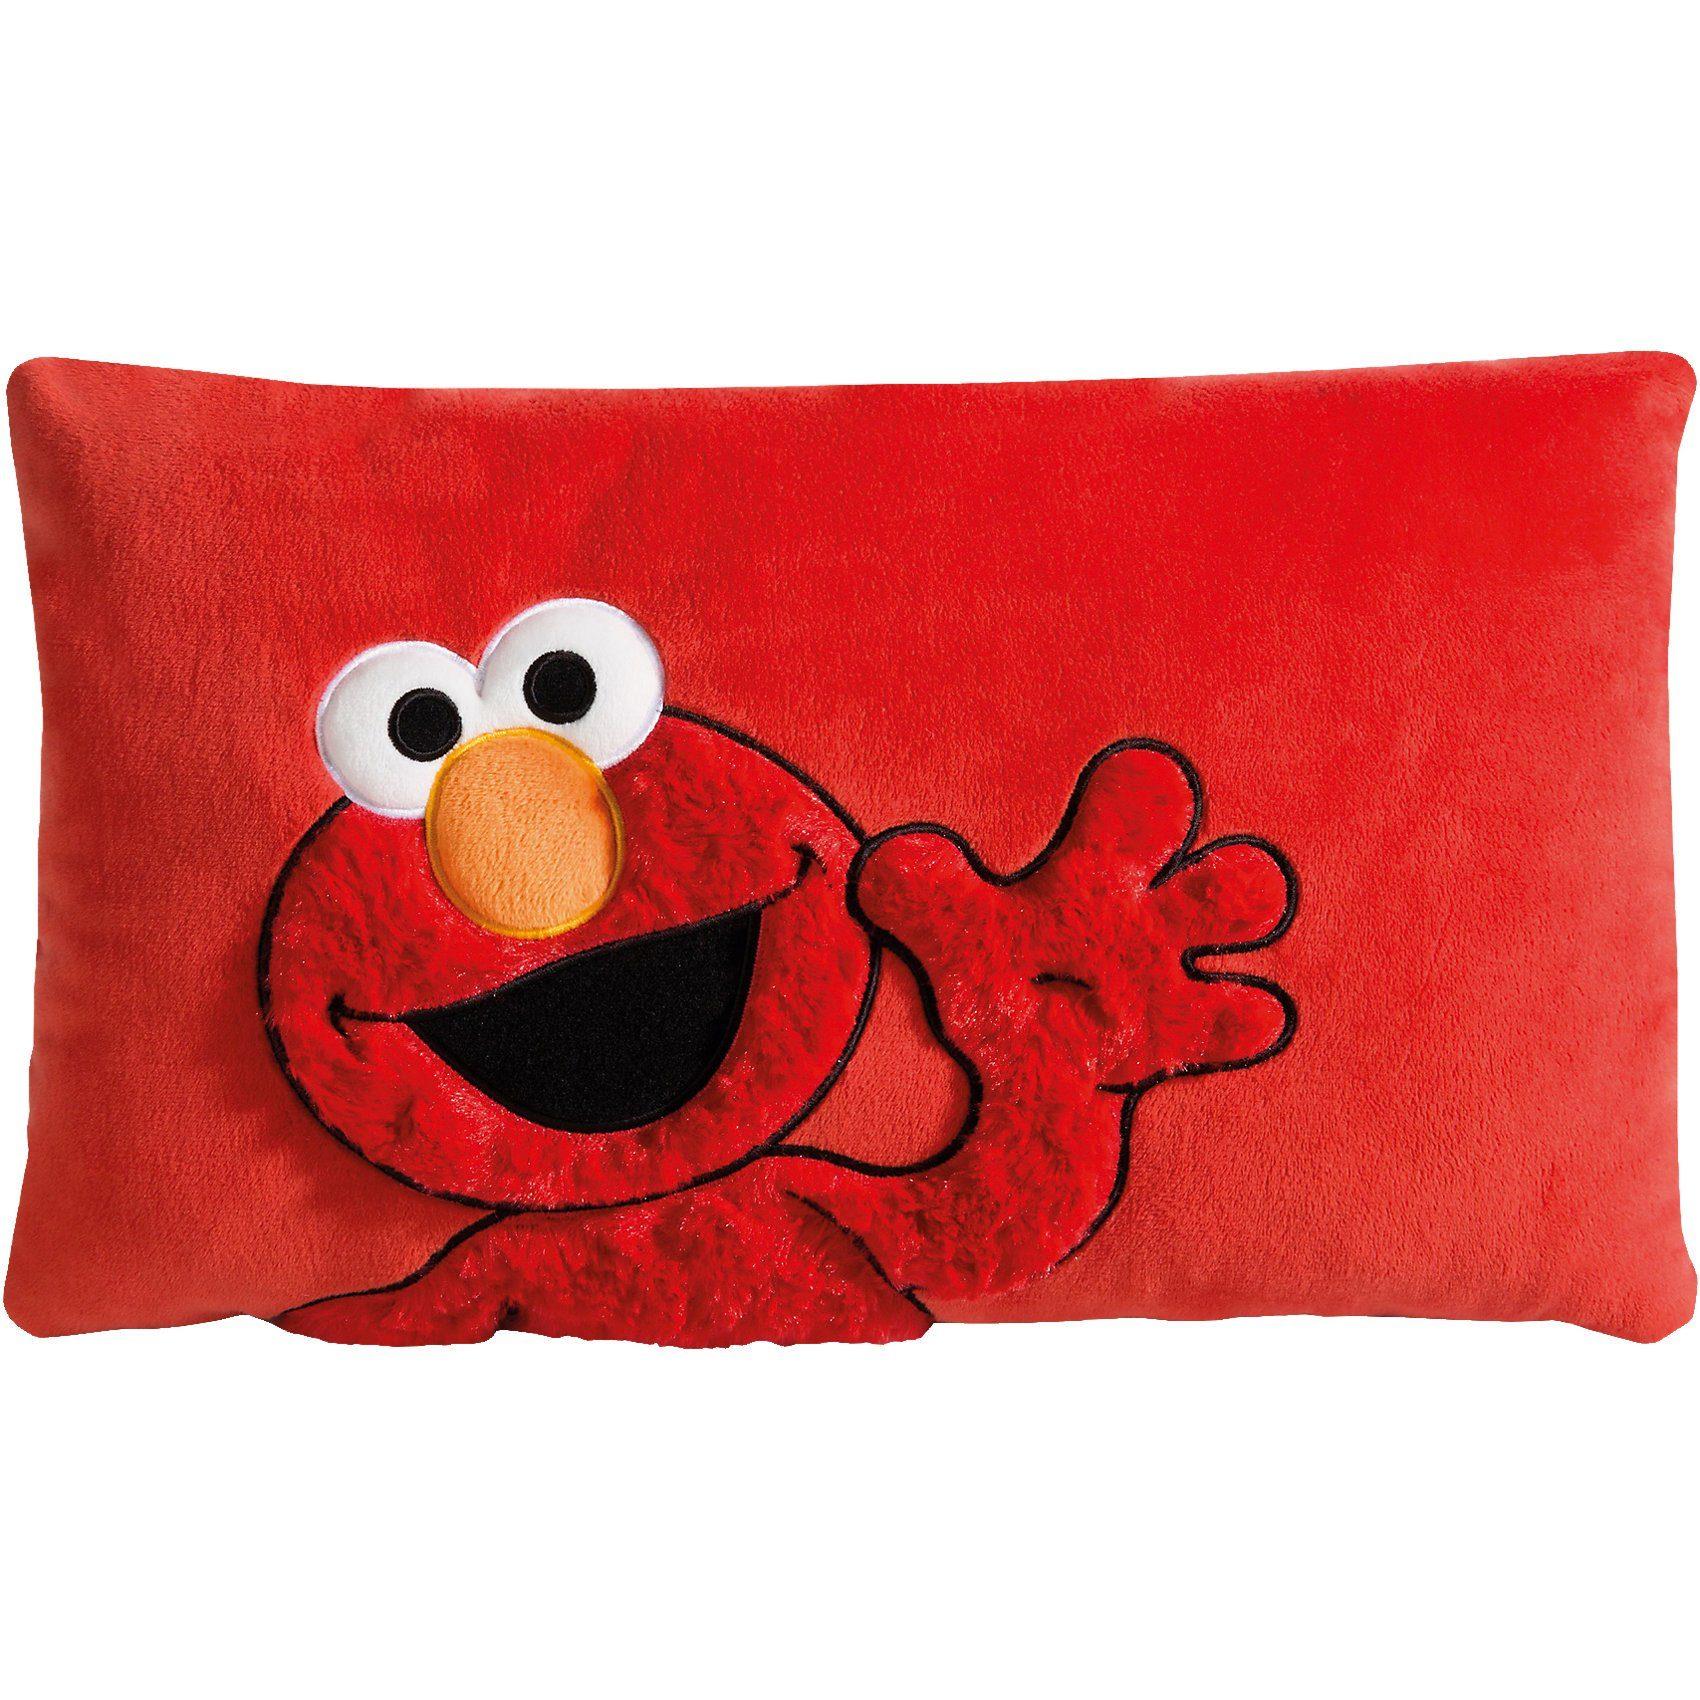 Kissen Elmo rechteckig, 43 x 25 cm (41354)